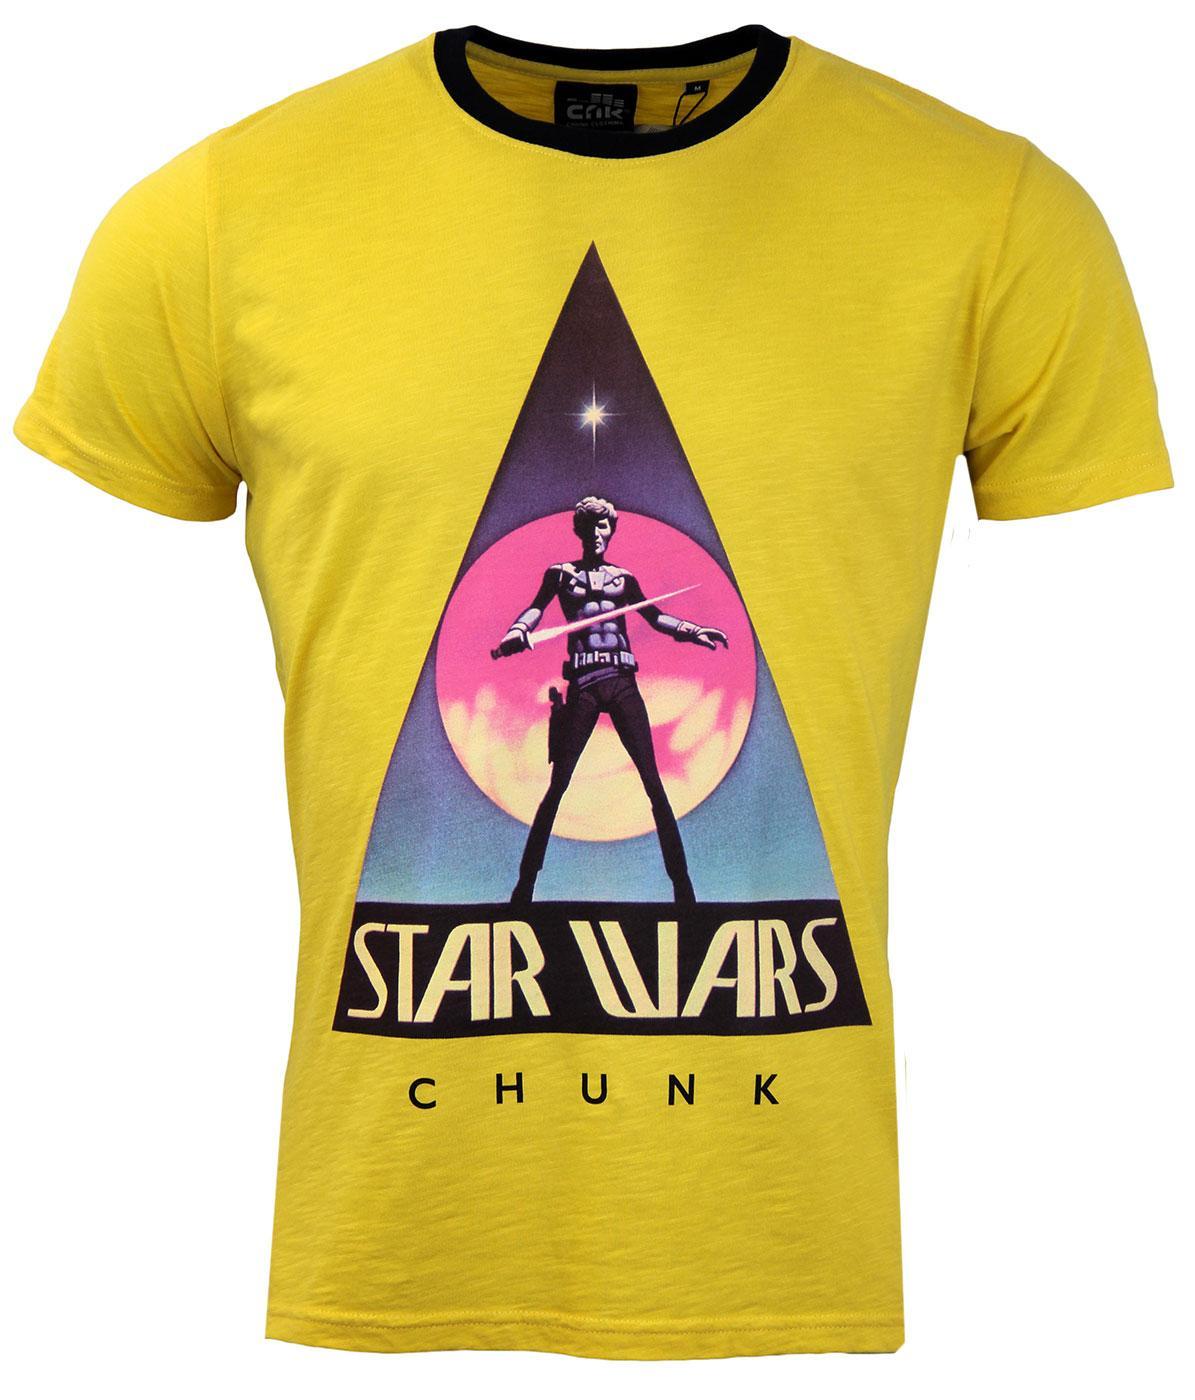 CHUNK Original Star Wars Logo Retro Poster T-Shirt